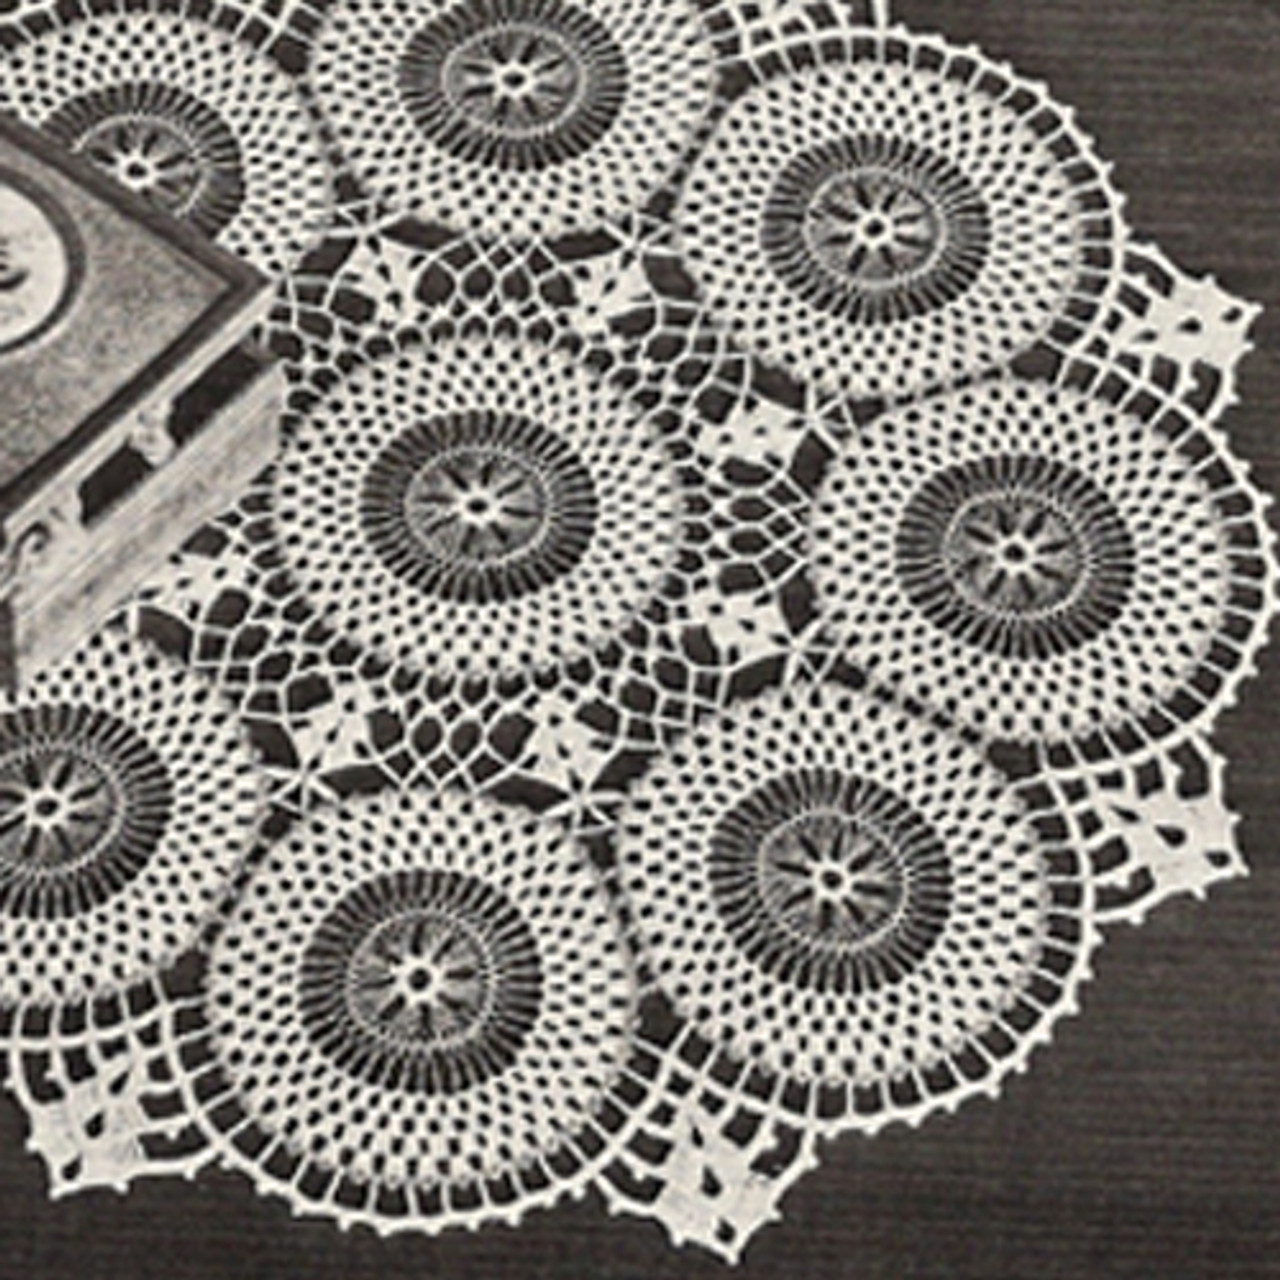 Lily Mills Circled Doily Crochet Pattern